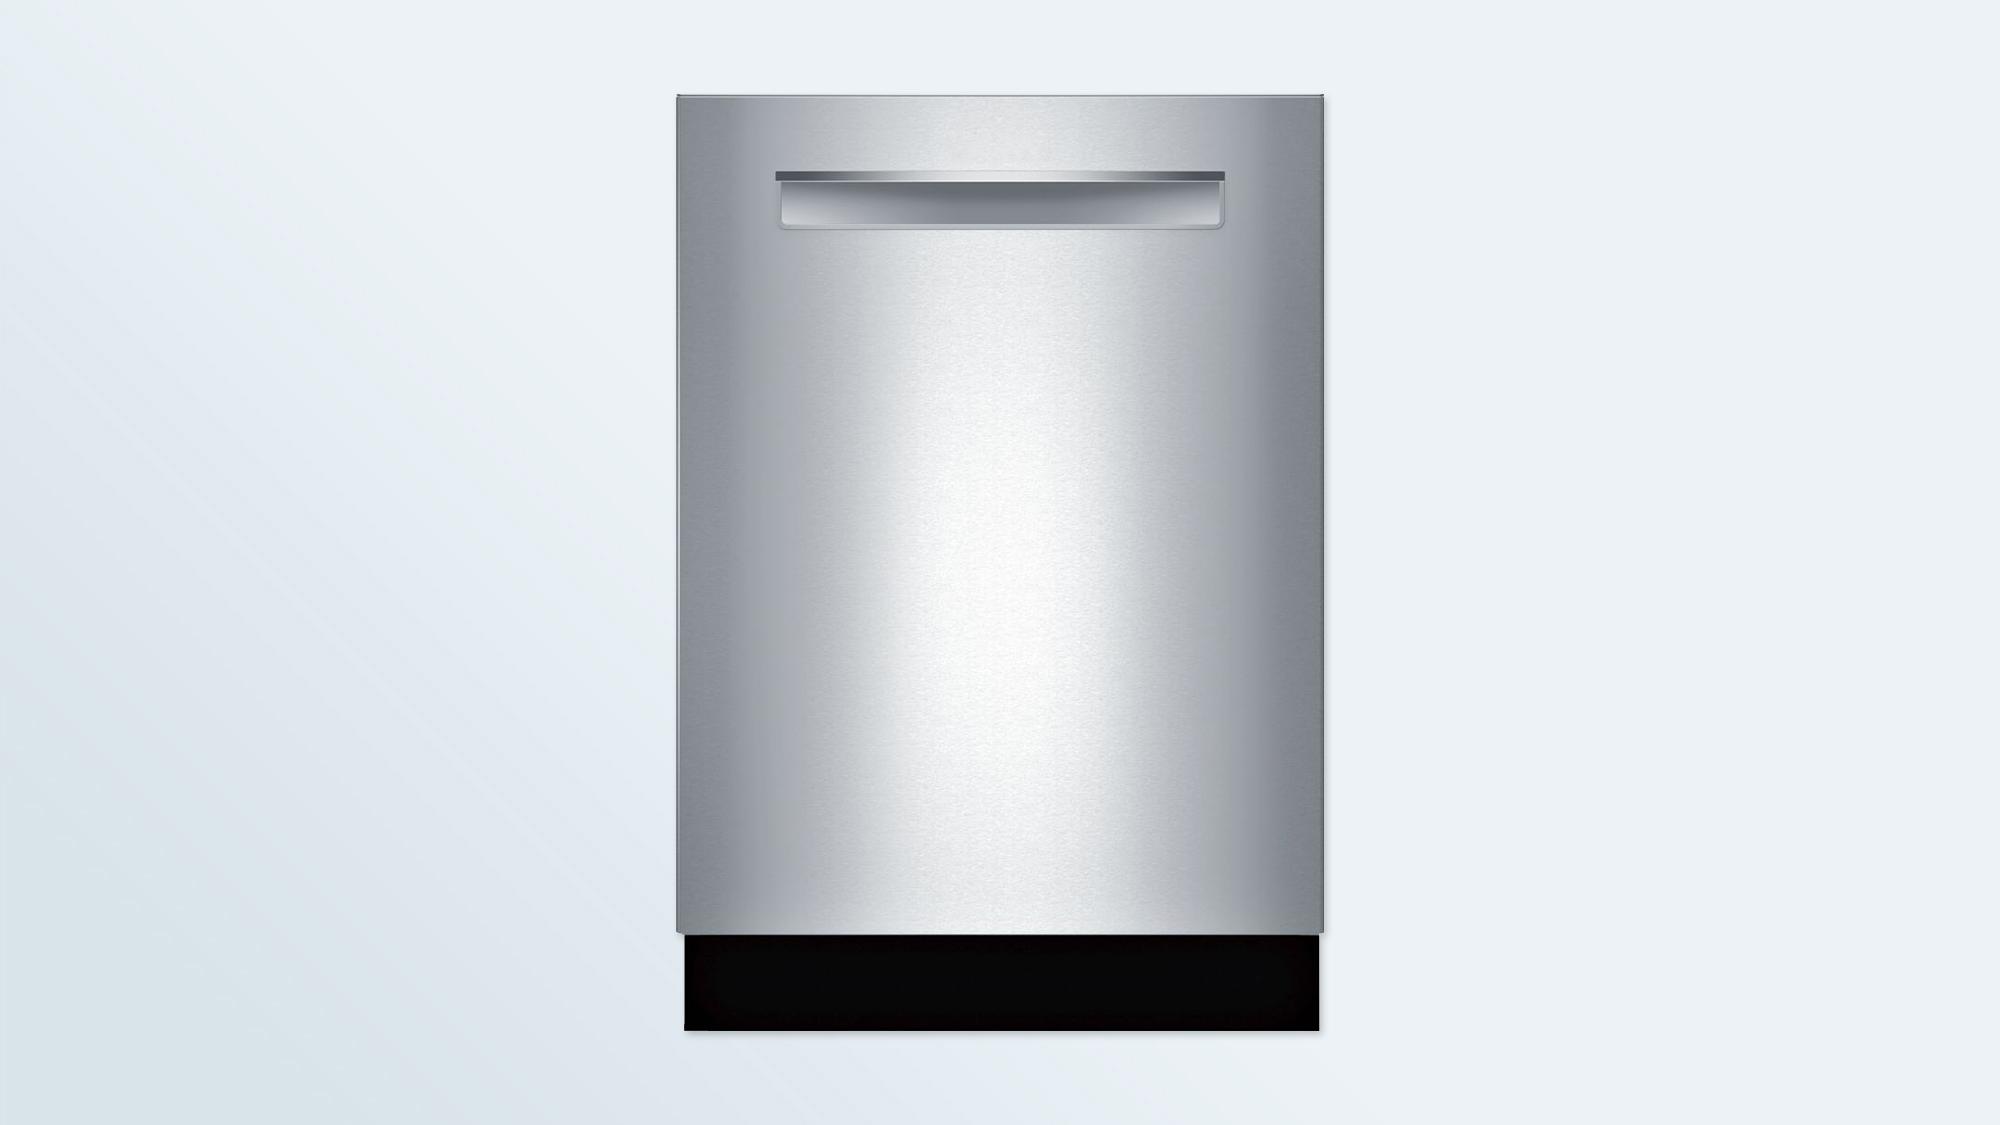 Best dishwashers: Bosch 800-Series SHP878ZD5N